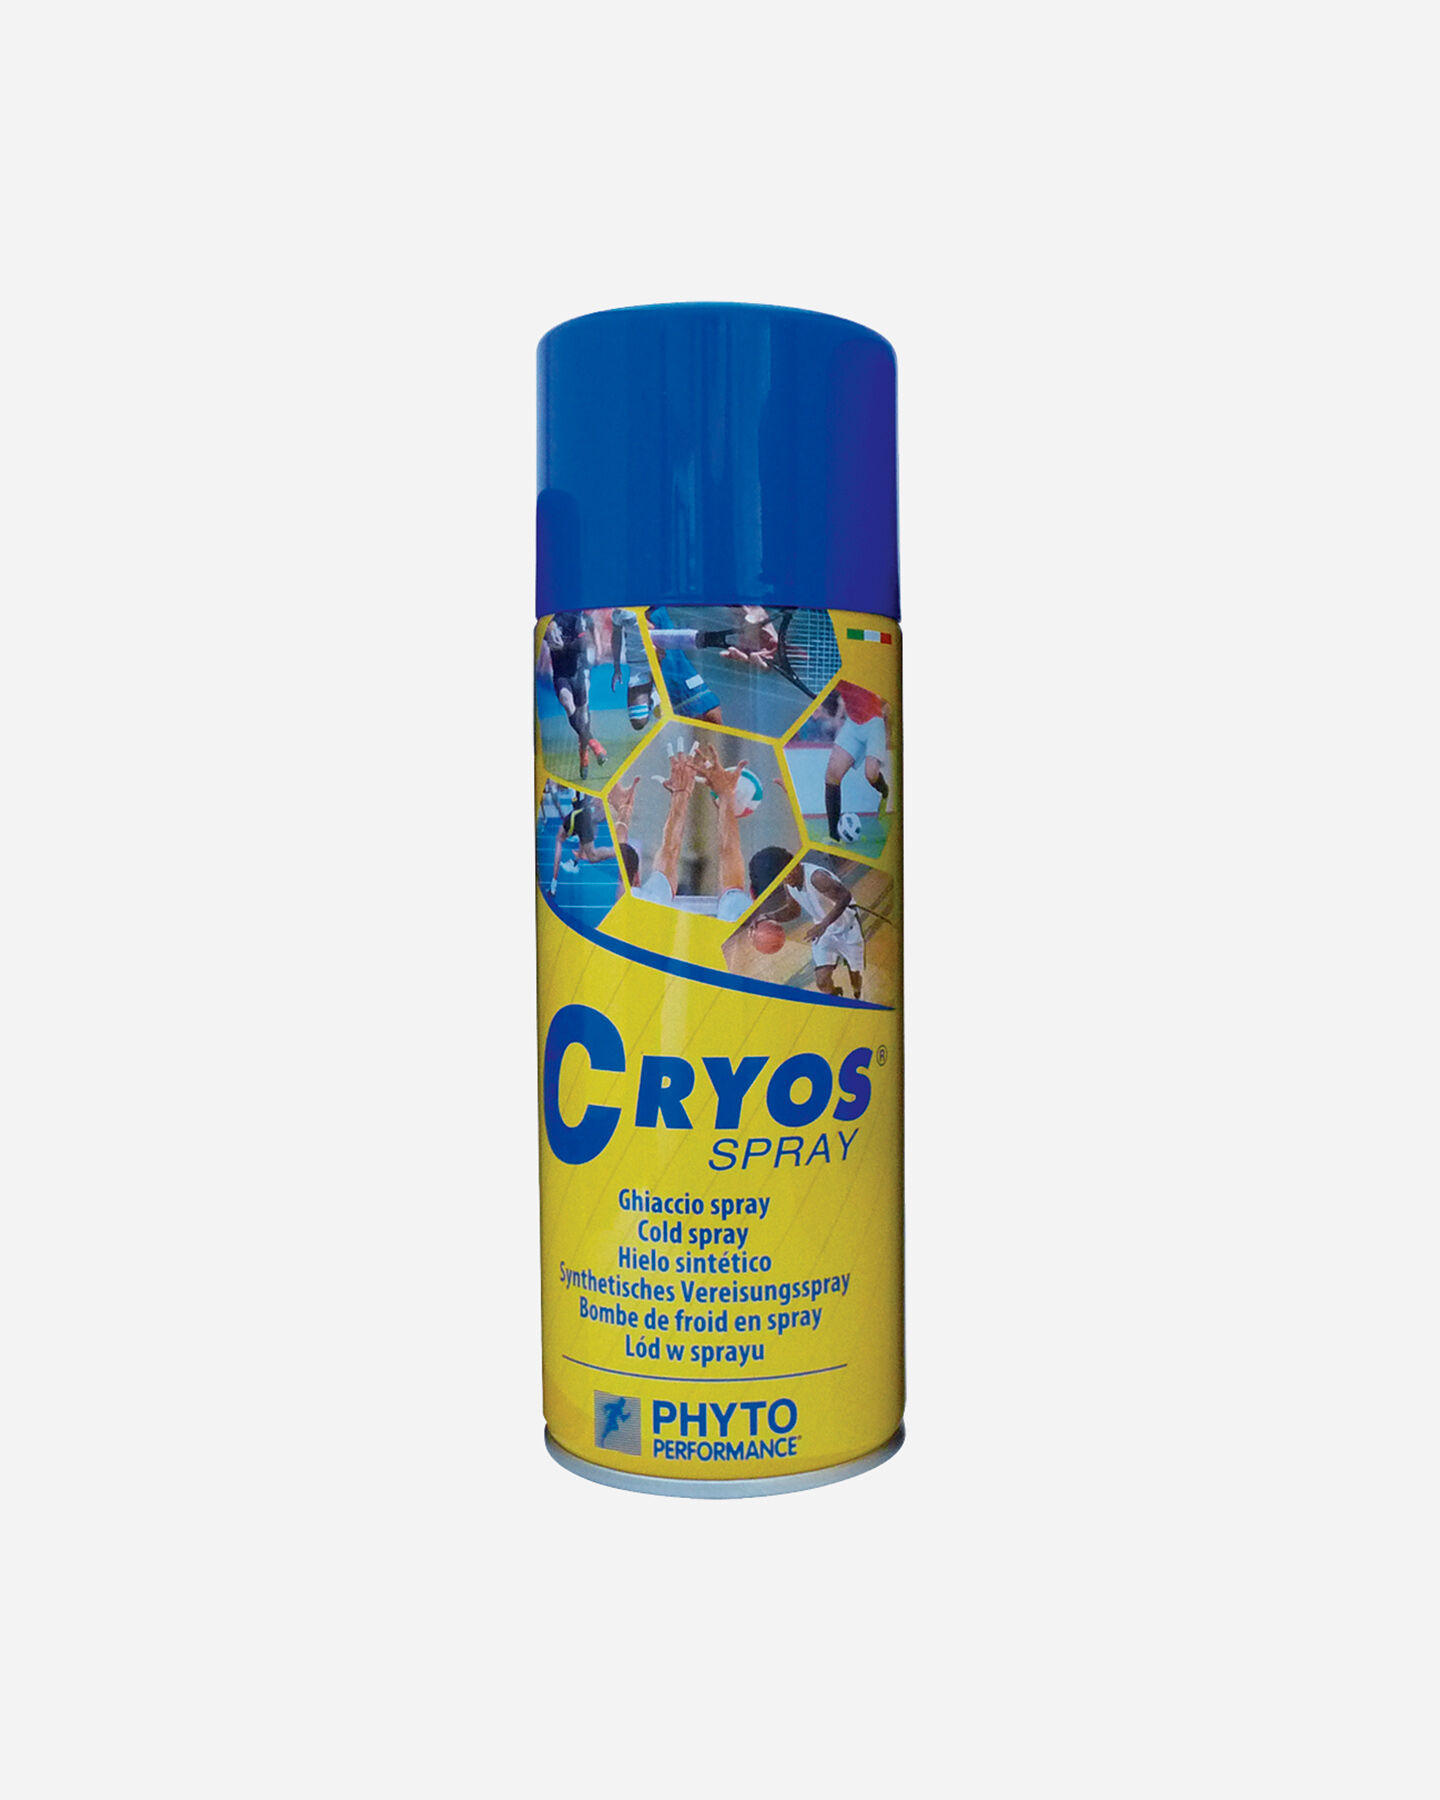 Gioco sport PHYTO PERFORMANCE GHIACCIO SPRAY CRYOS 400ML  S0183397 9999 UNI scatto 0